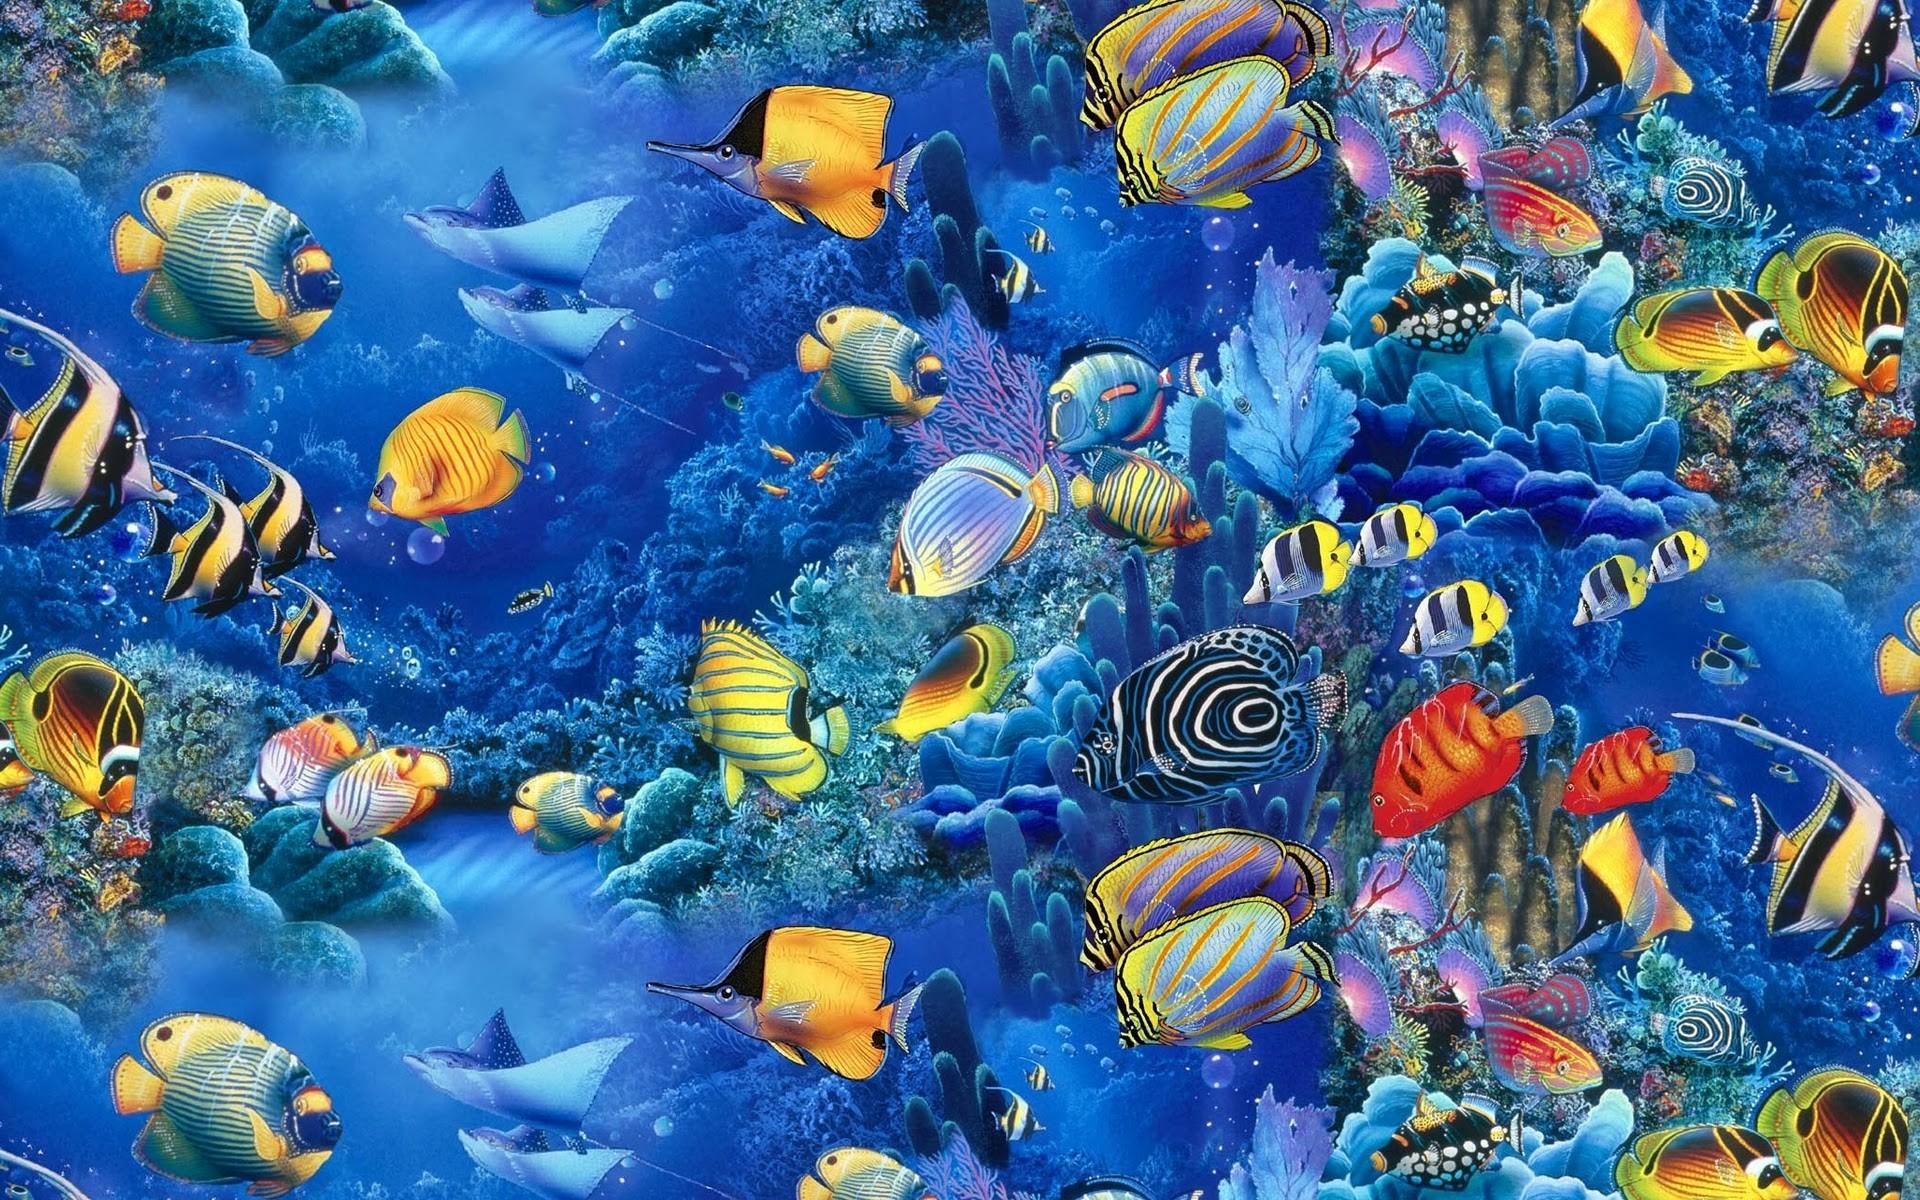 Beautiful Fish Wallpapers Free Download HD Wallpapers Pop 1920×1080 Images  Of Fish Wallpapers (